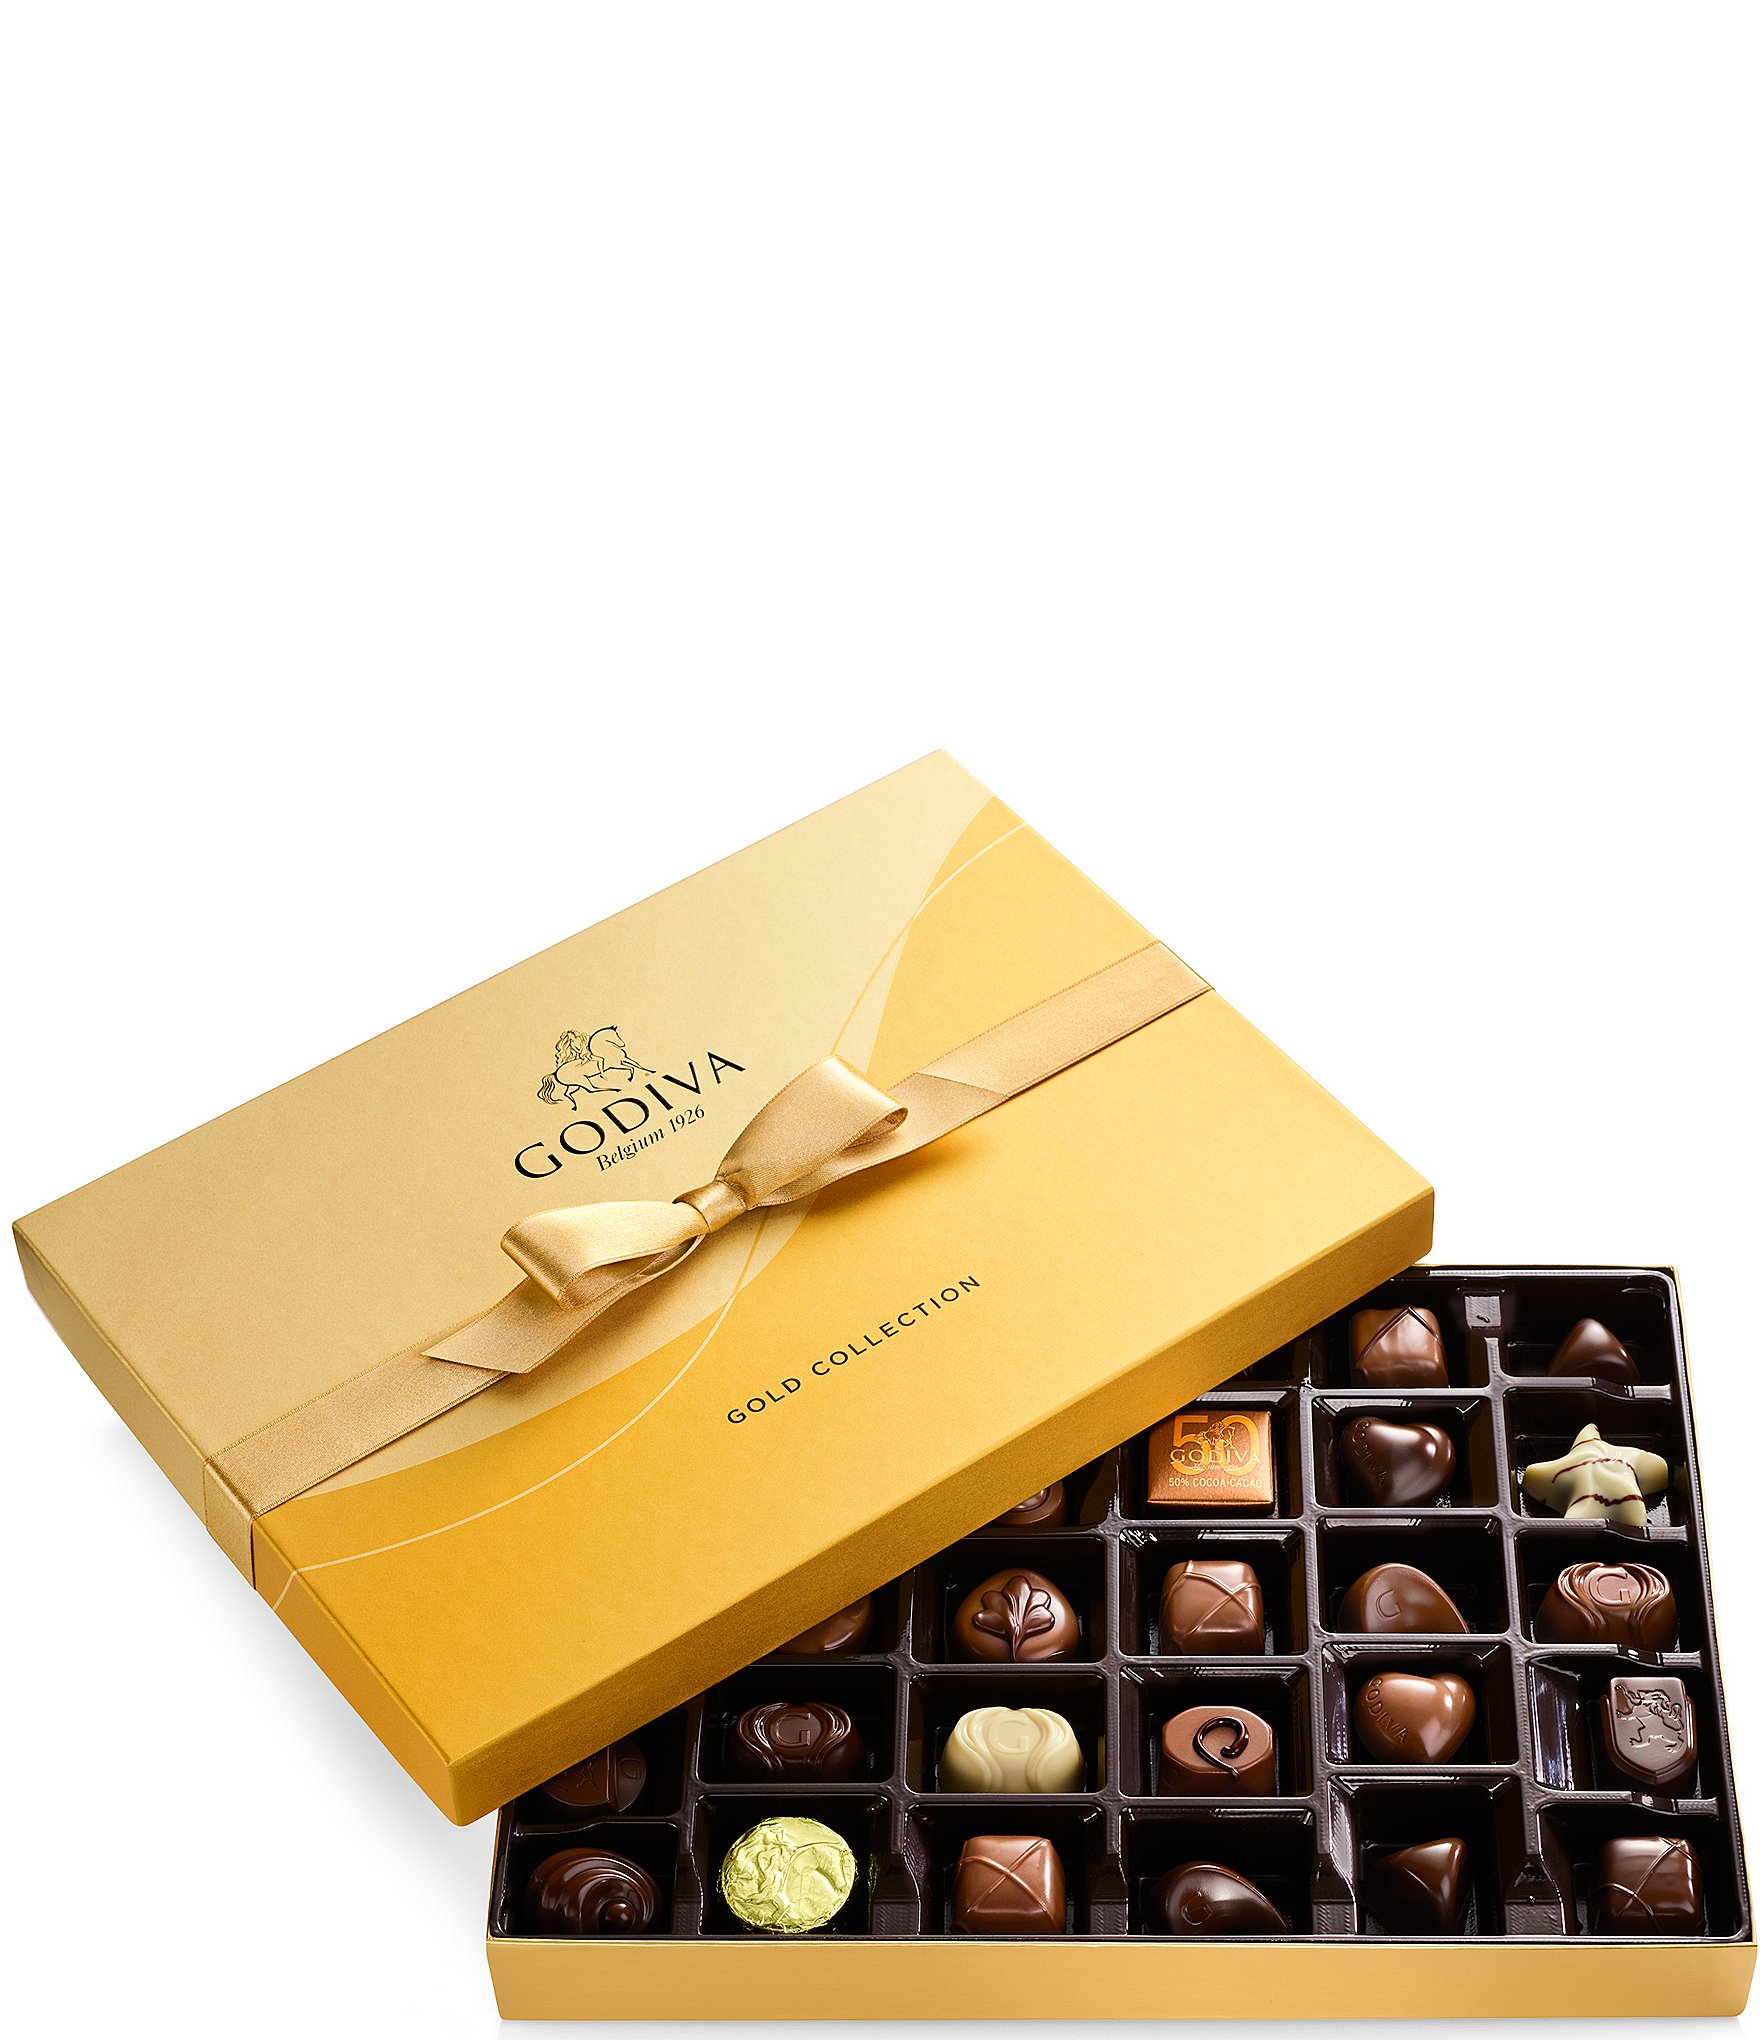 Godiva Chocolatier 36 Piece Chocolate Gold Gift Box Dillards